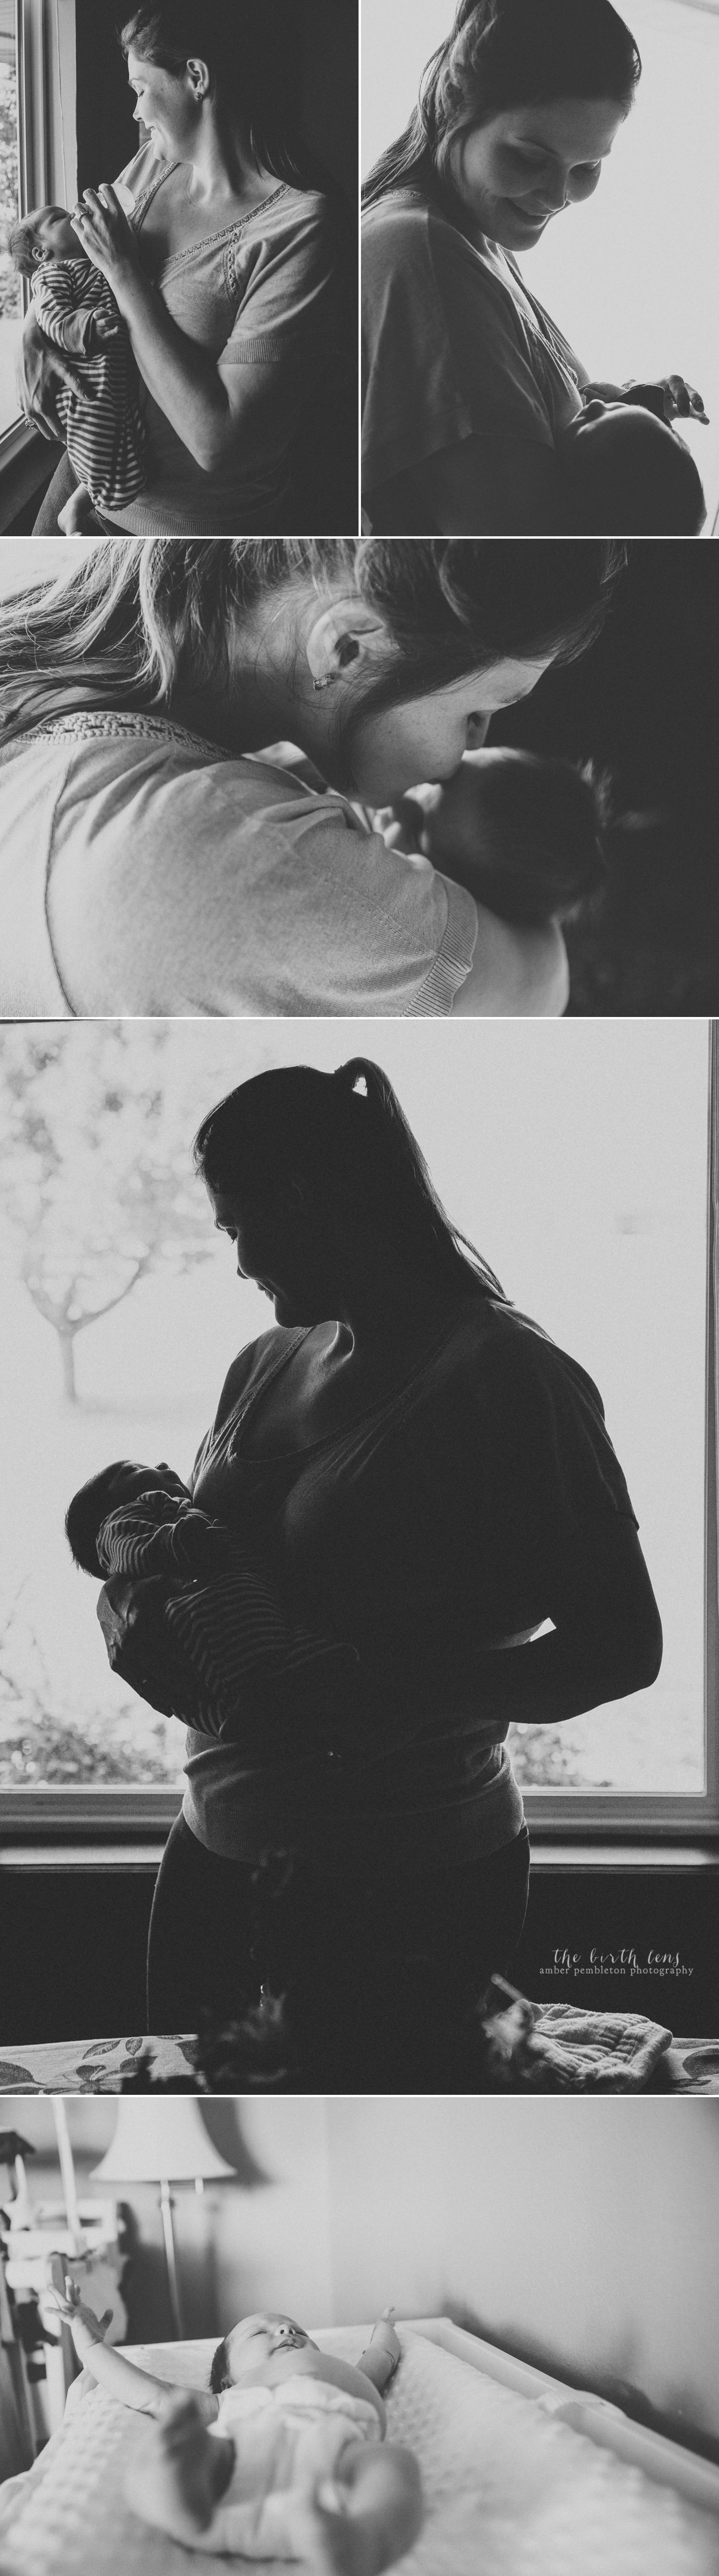 mom-with-newborn-black-and-white-in-window-lake-tahoe.jpg